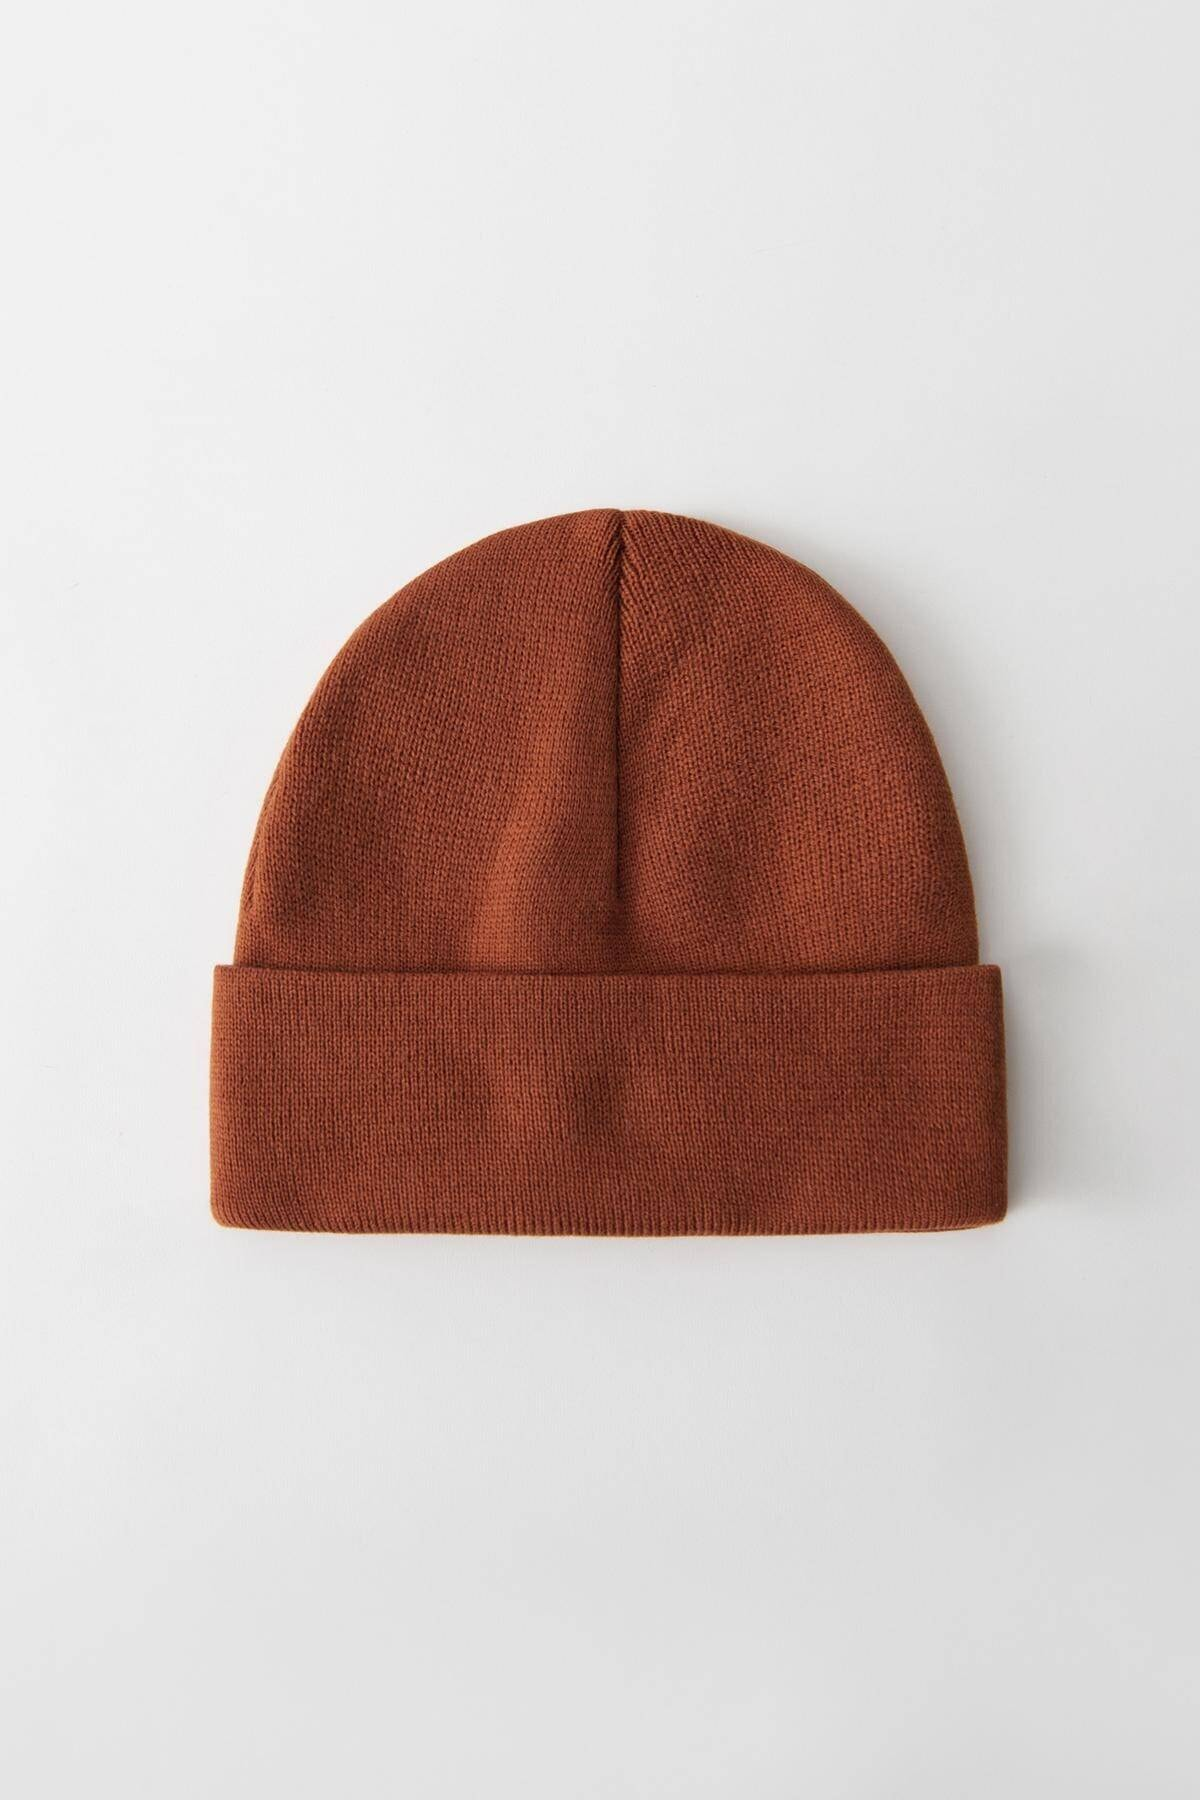 Addax Kadın Kiremit Şapka Şpk12835 - Aks -e5 ADX-0000020470 2